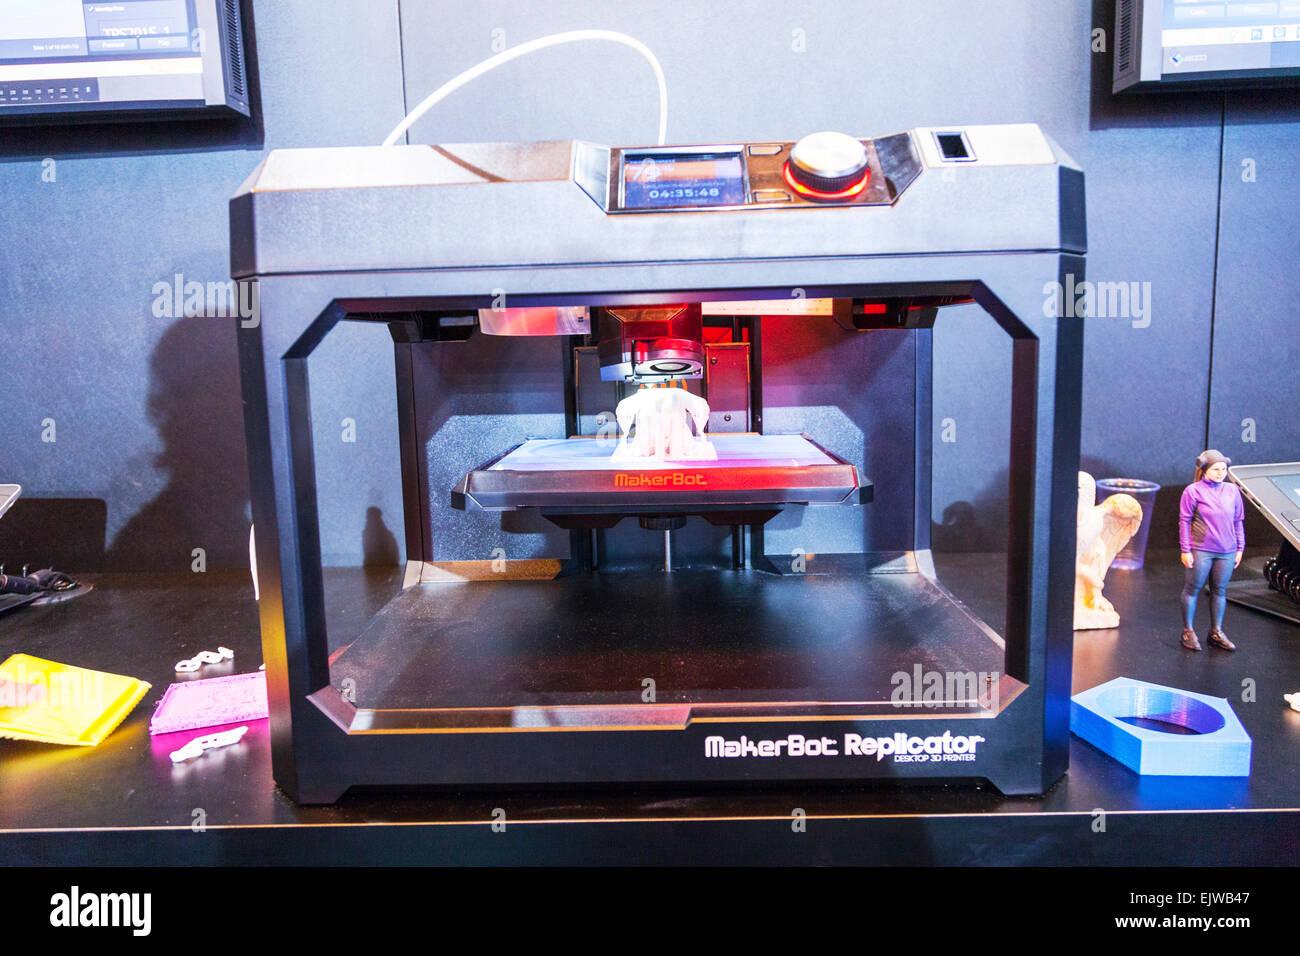 3d printer making plastic model printing machine working three dimensional item for medical use usage uses future - Stock Image